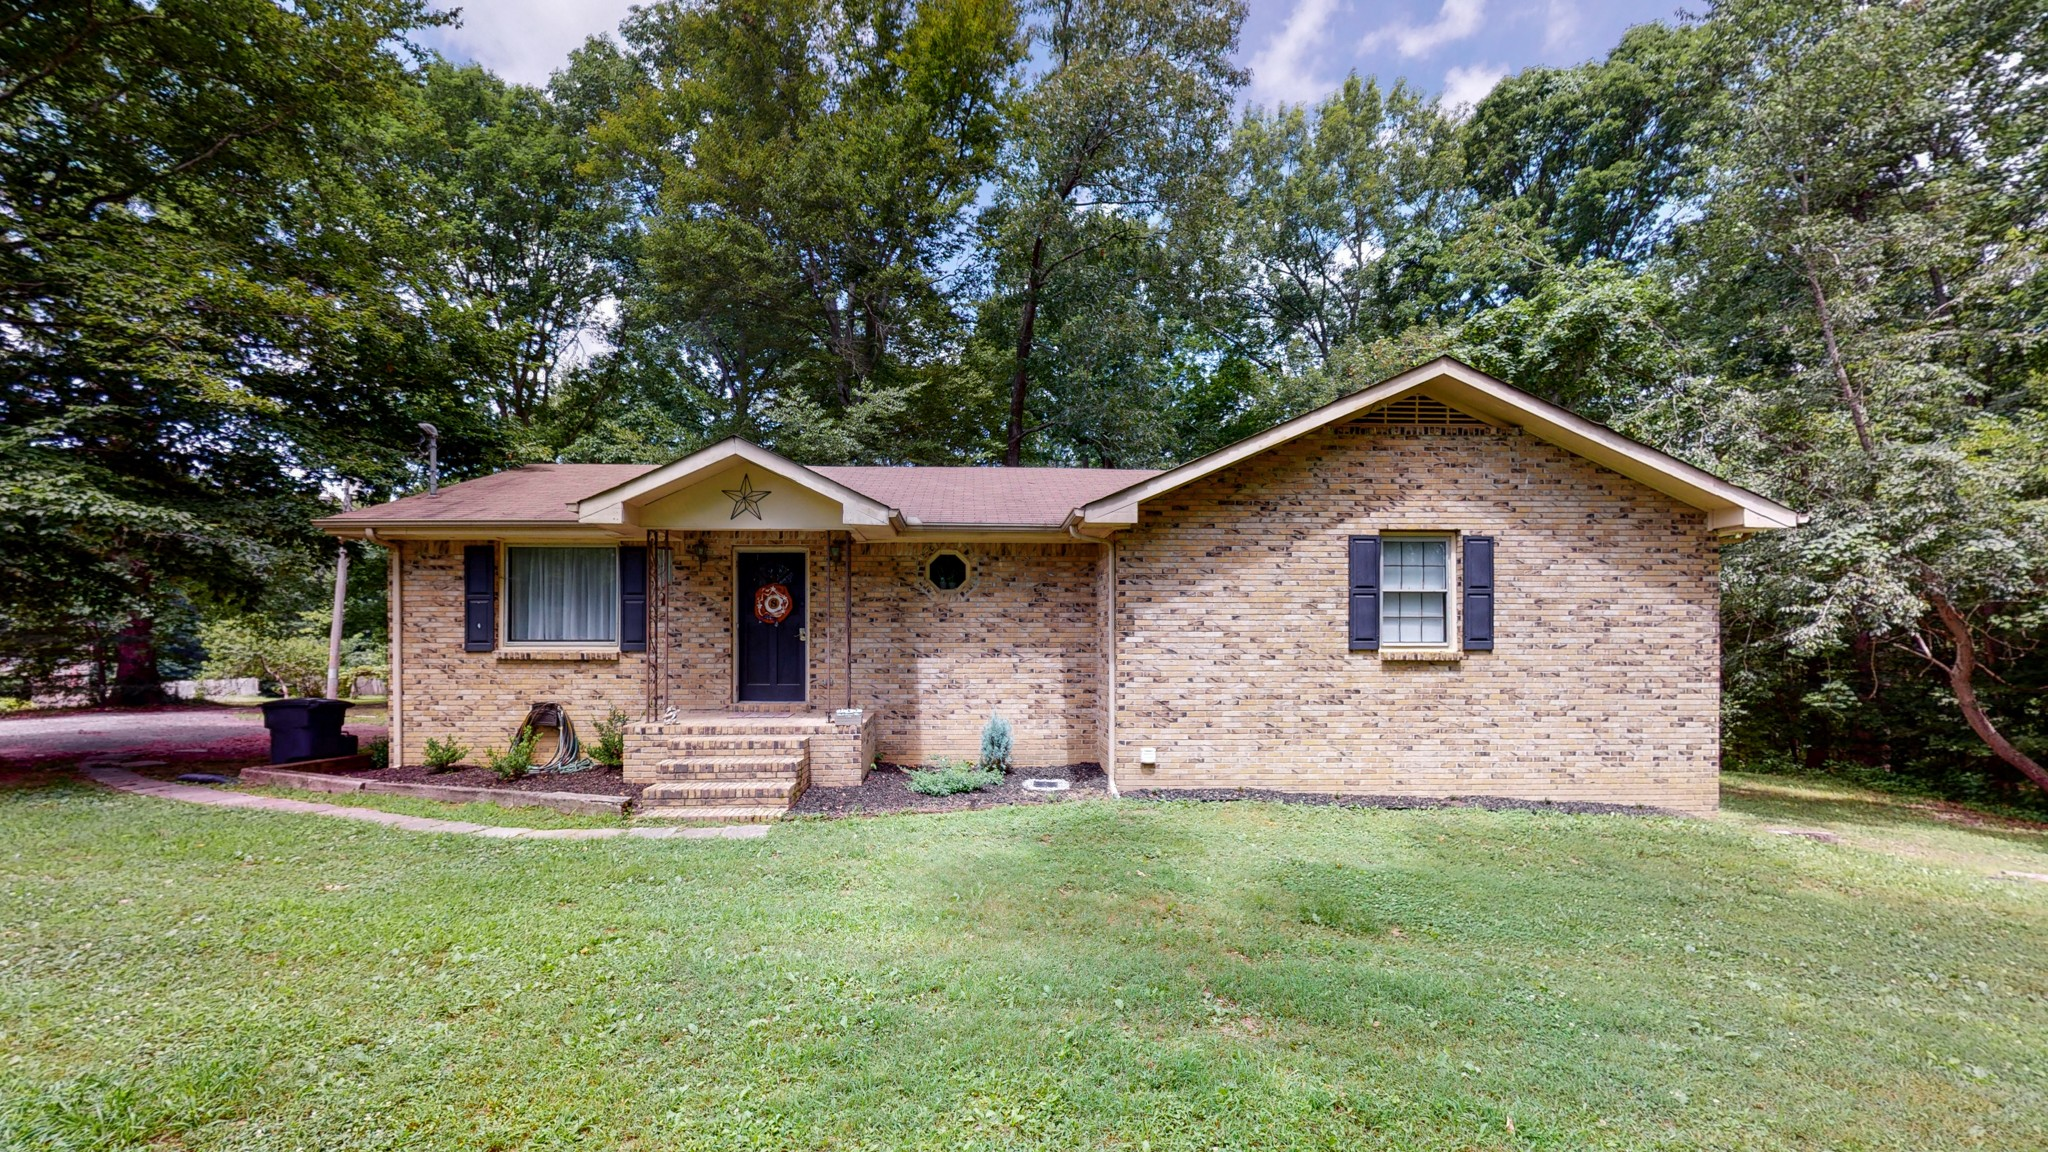 6031 Beech Hill Rd Property Photo - Pegram, TN real estate listing